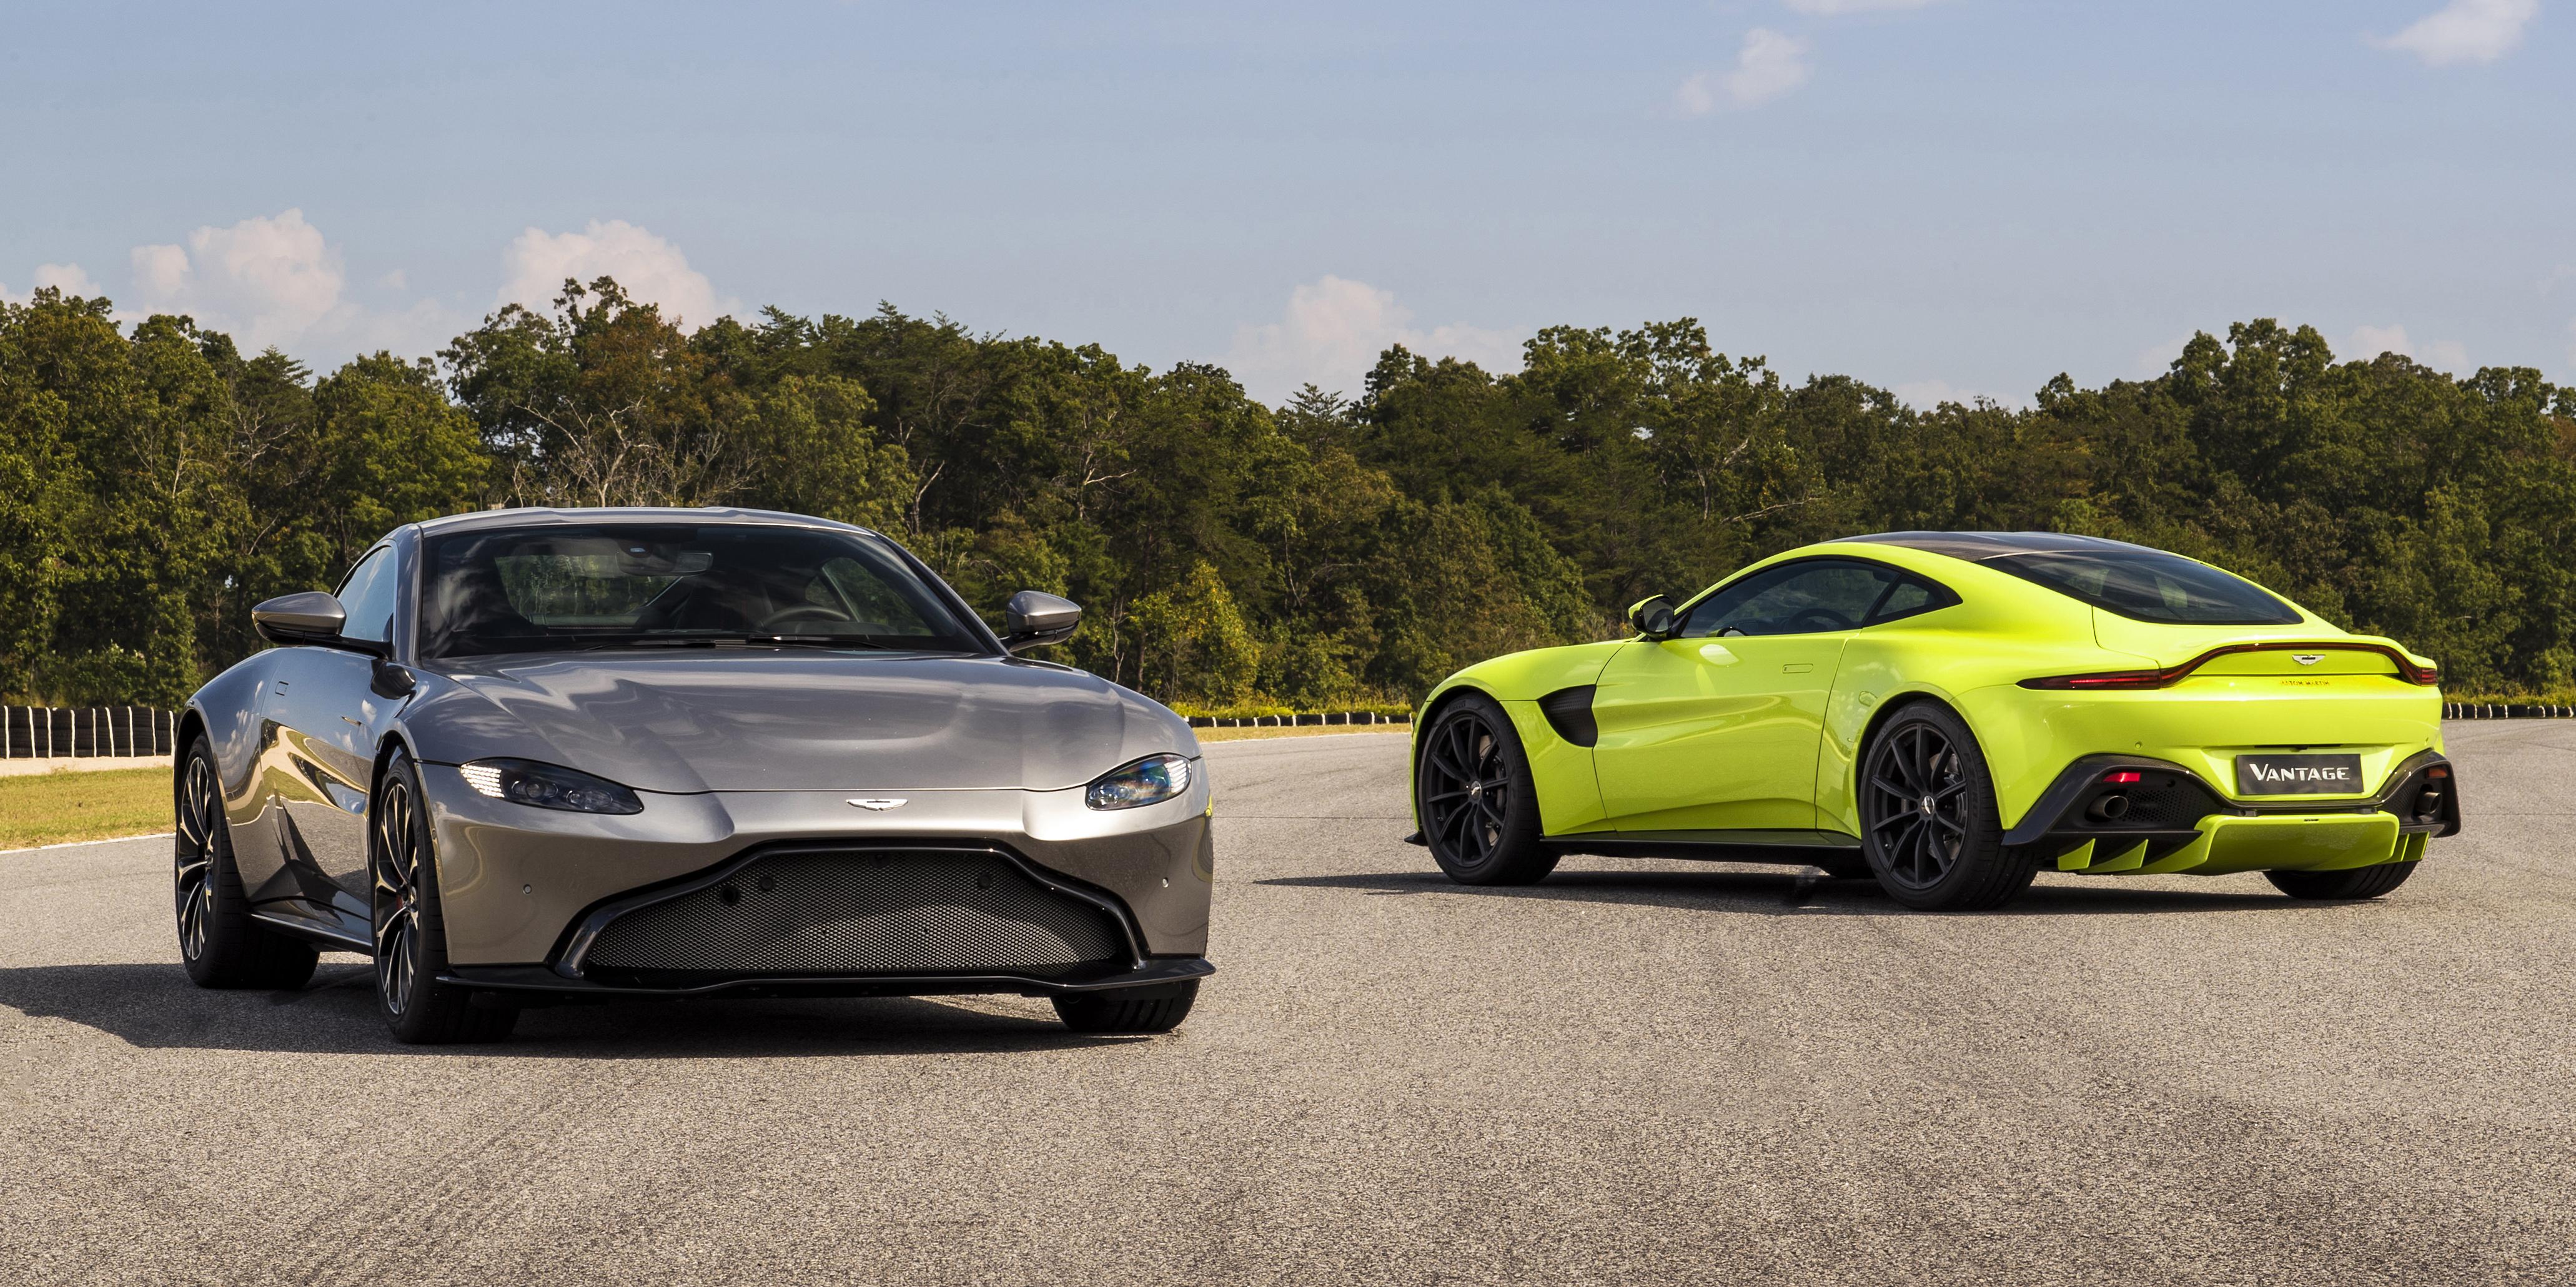 Aston Martin V8 Vantage Price New - Auto Express